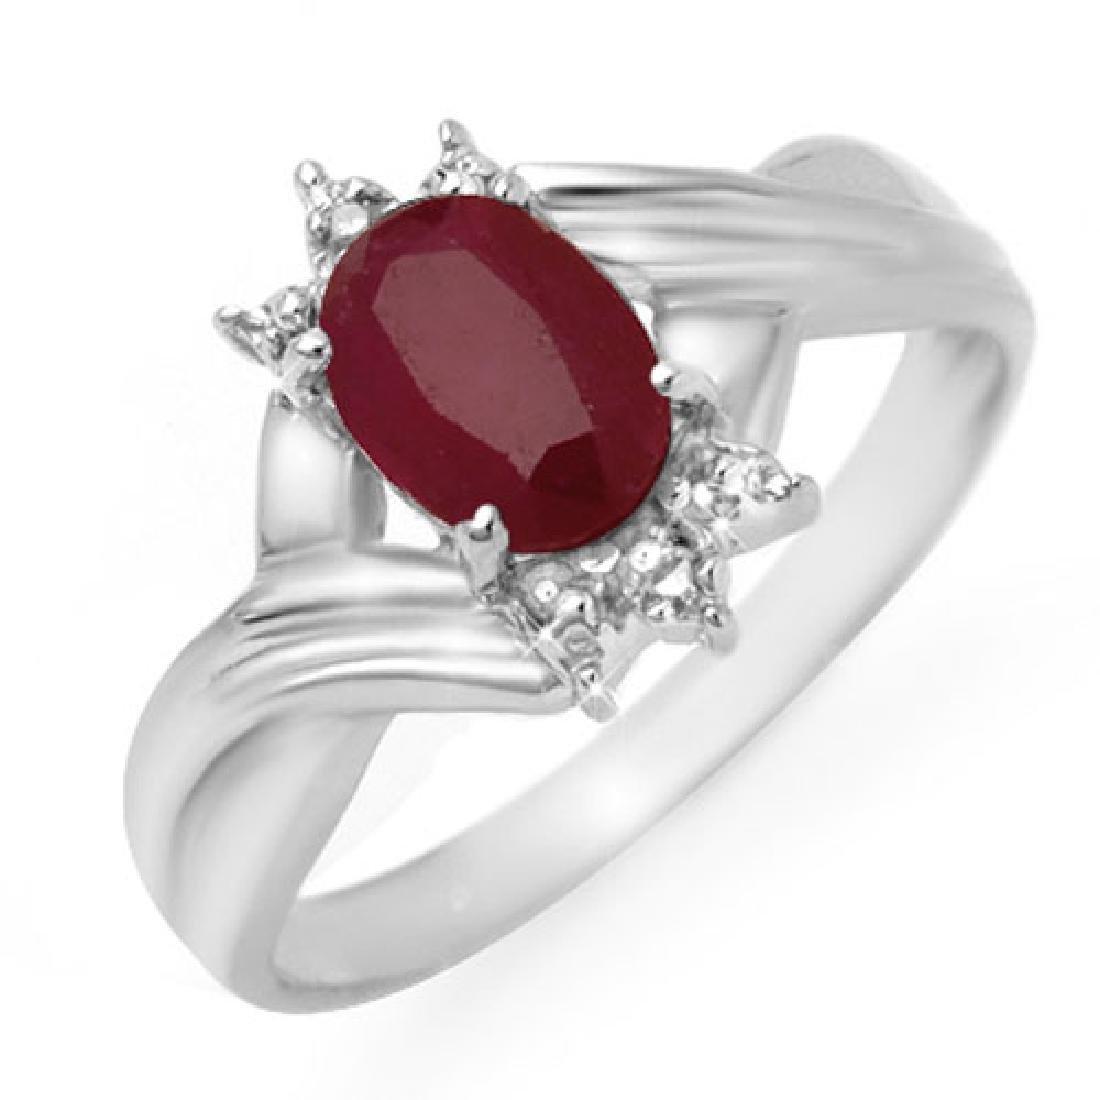 1.12 CTW Ruby & Diamond Ring 10K White Gold